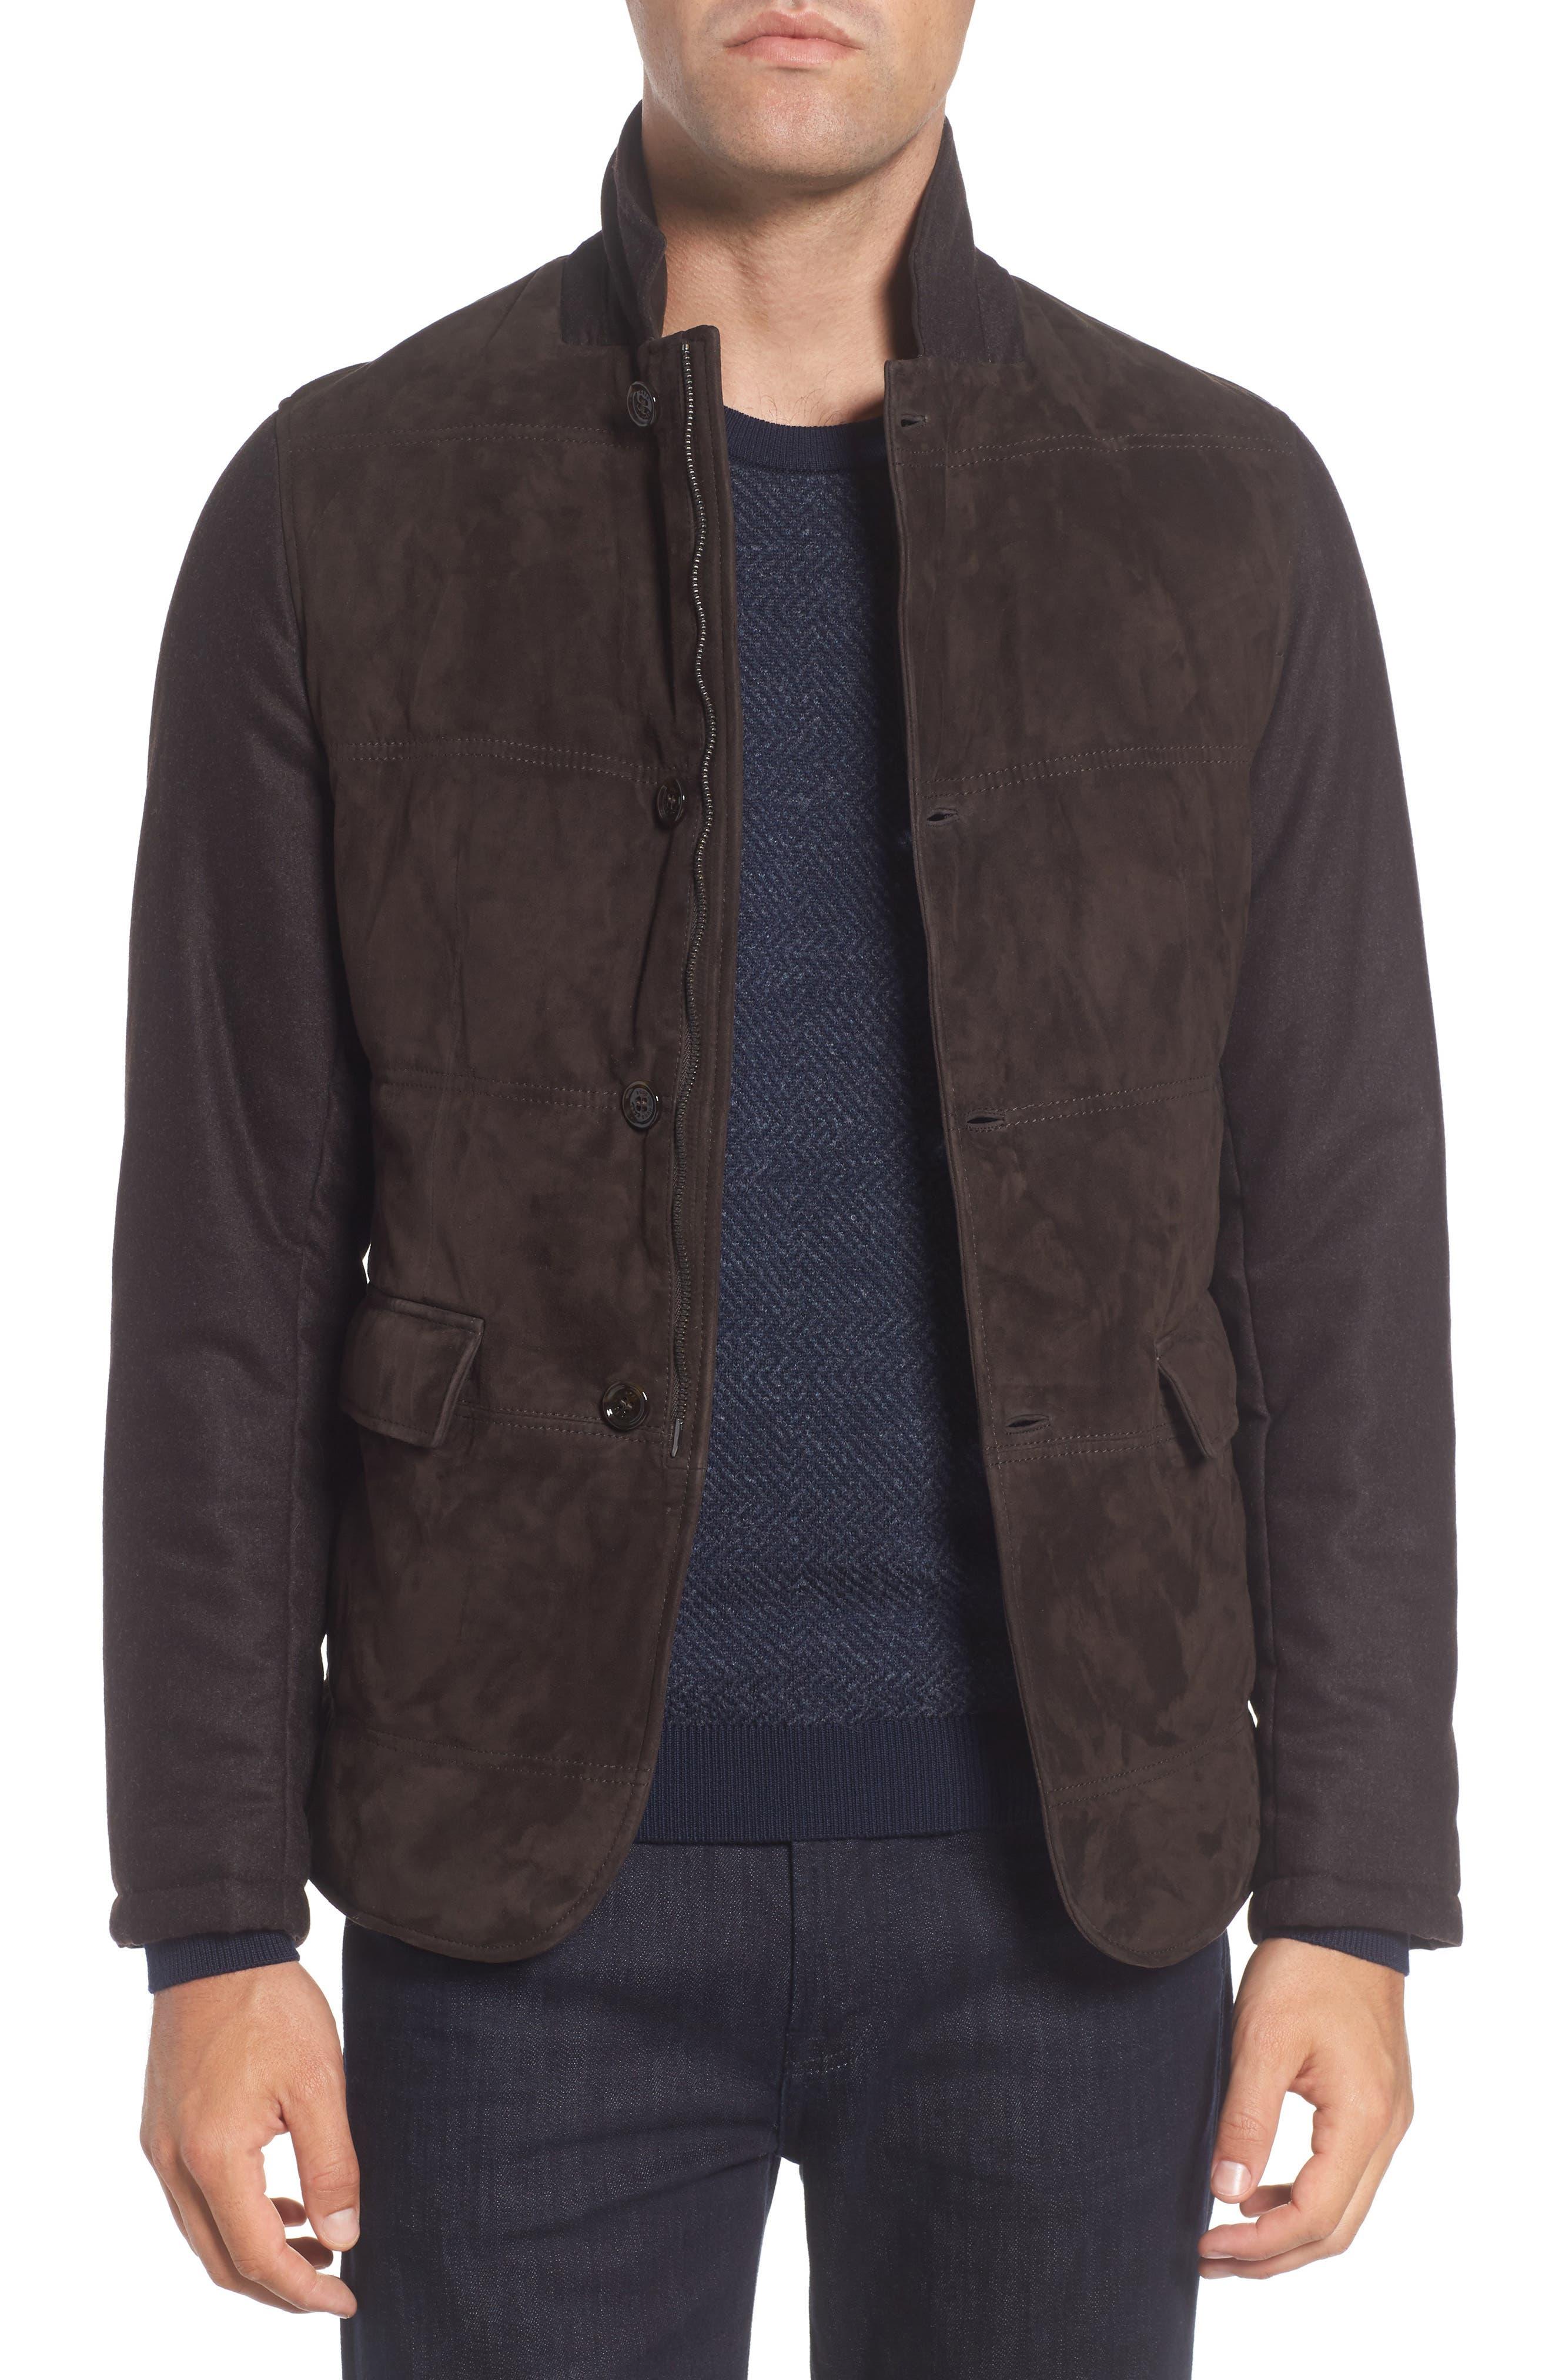 T-Cobas Slim Fit Mixed Media Jacket,                         Main,                         color, Brown